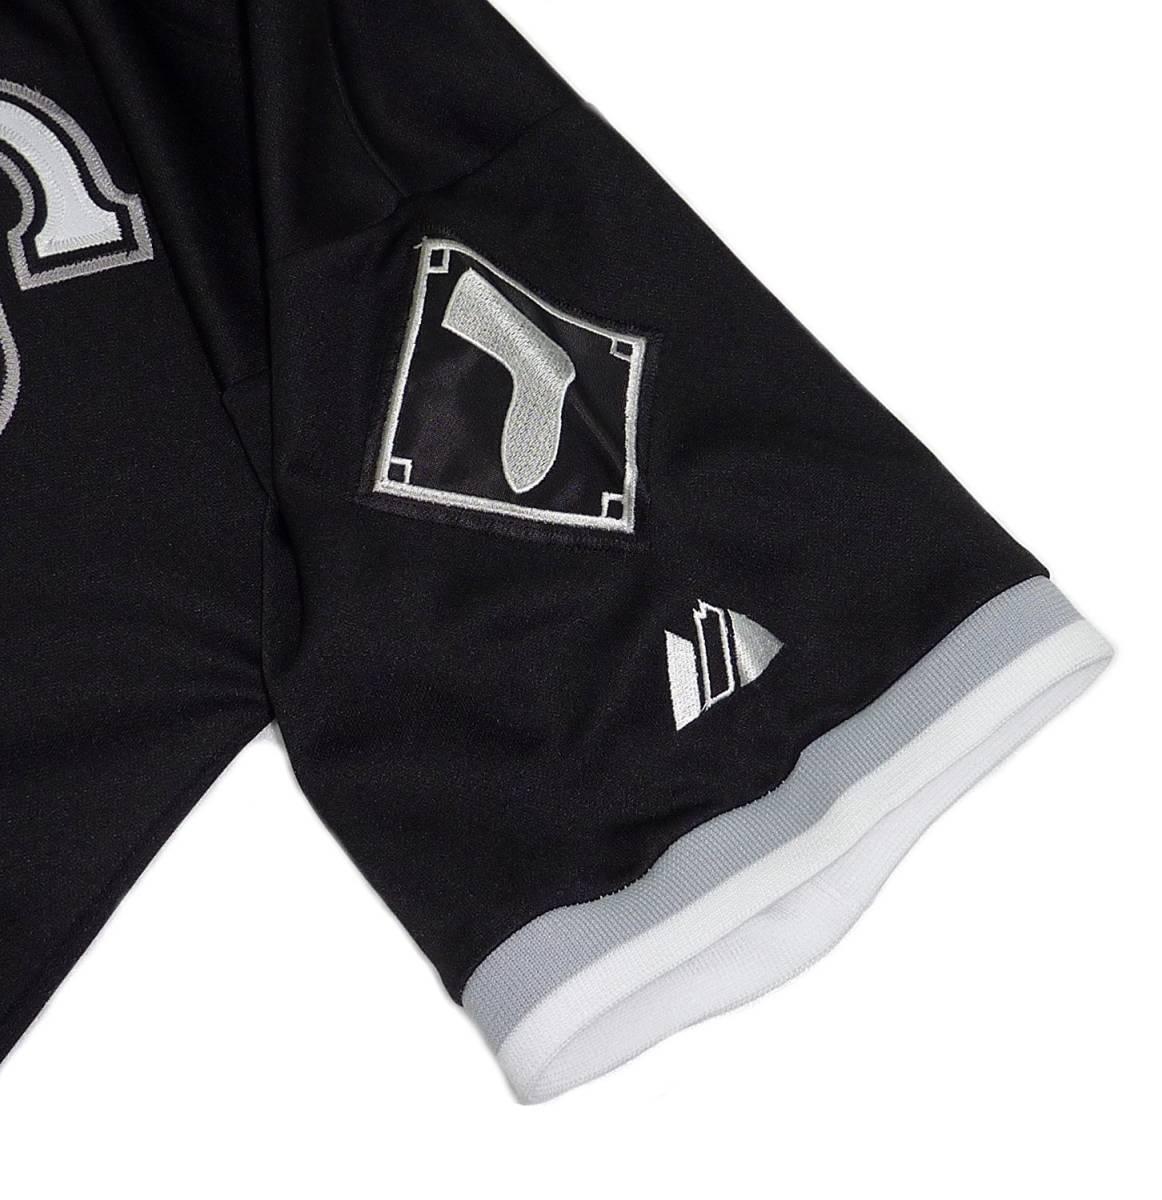 Majestic マジェスティック クーパースタウン マイケル ジョーダン ホワイト ソックス ベースボールシャツ(ブラック)(L)【並行輸入品】 _画像6